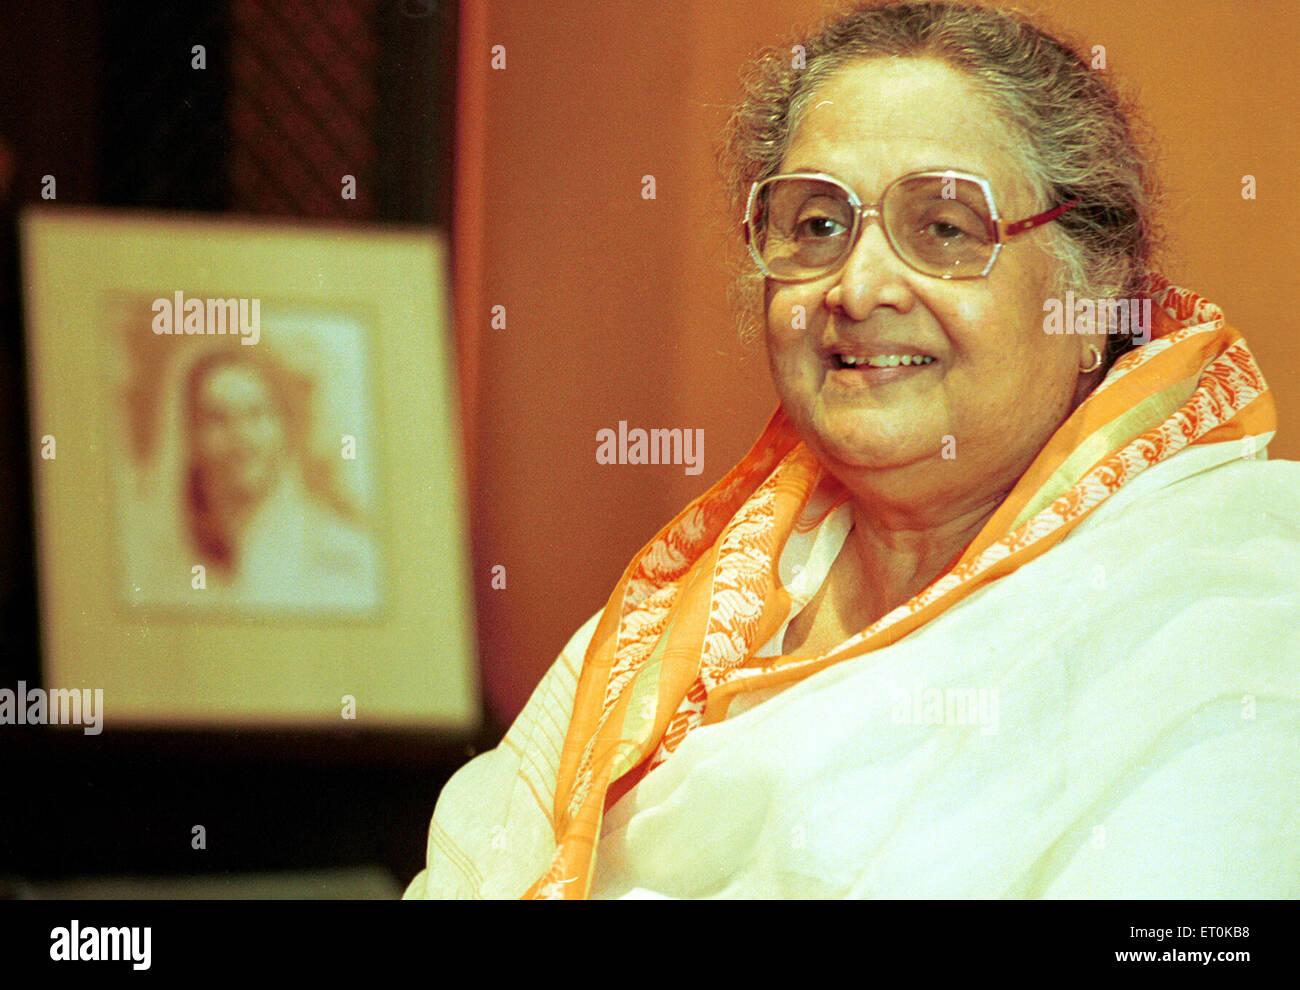 Senior-Marathi Film Persönlichkeit Sulochana während Veranstaltung Bombay Mumbai; Maharashtra; Indien Stockbild